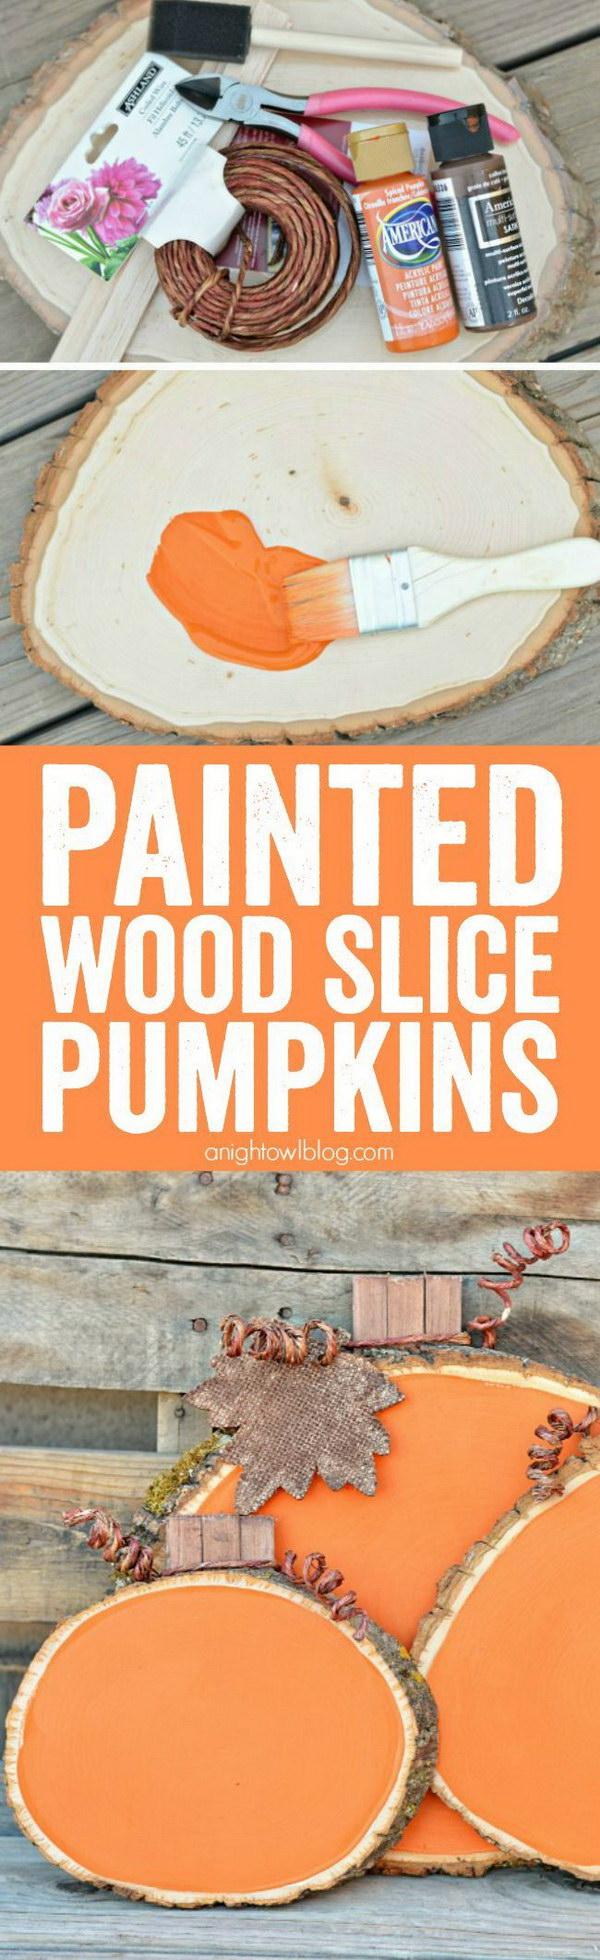 4 Painted Wood Slice Pumpkins